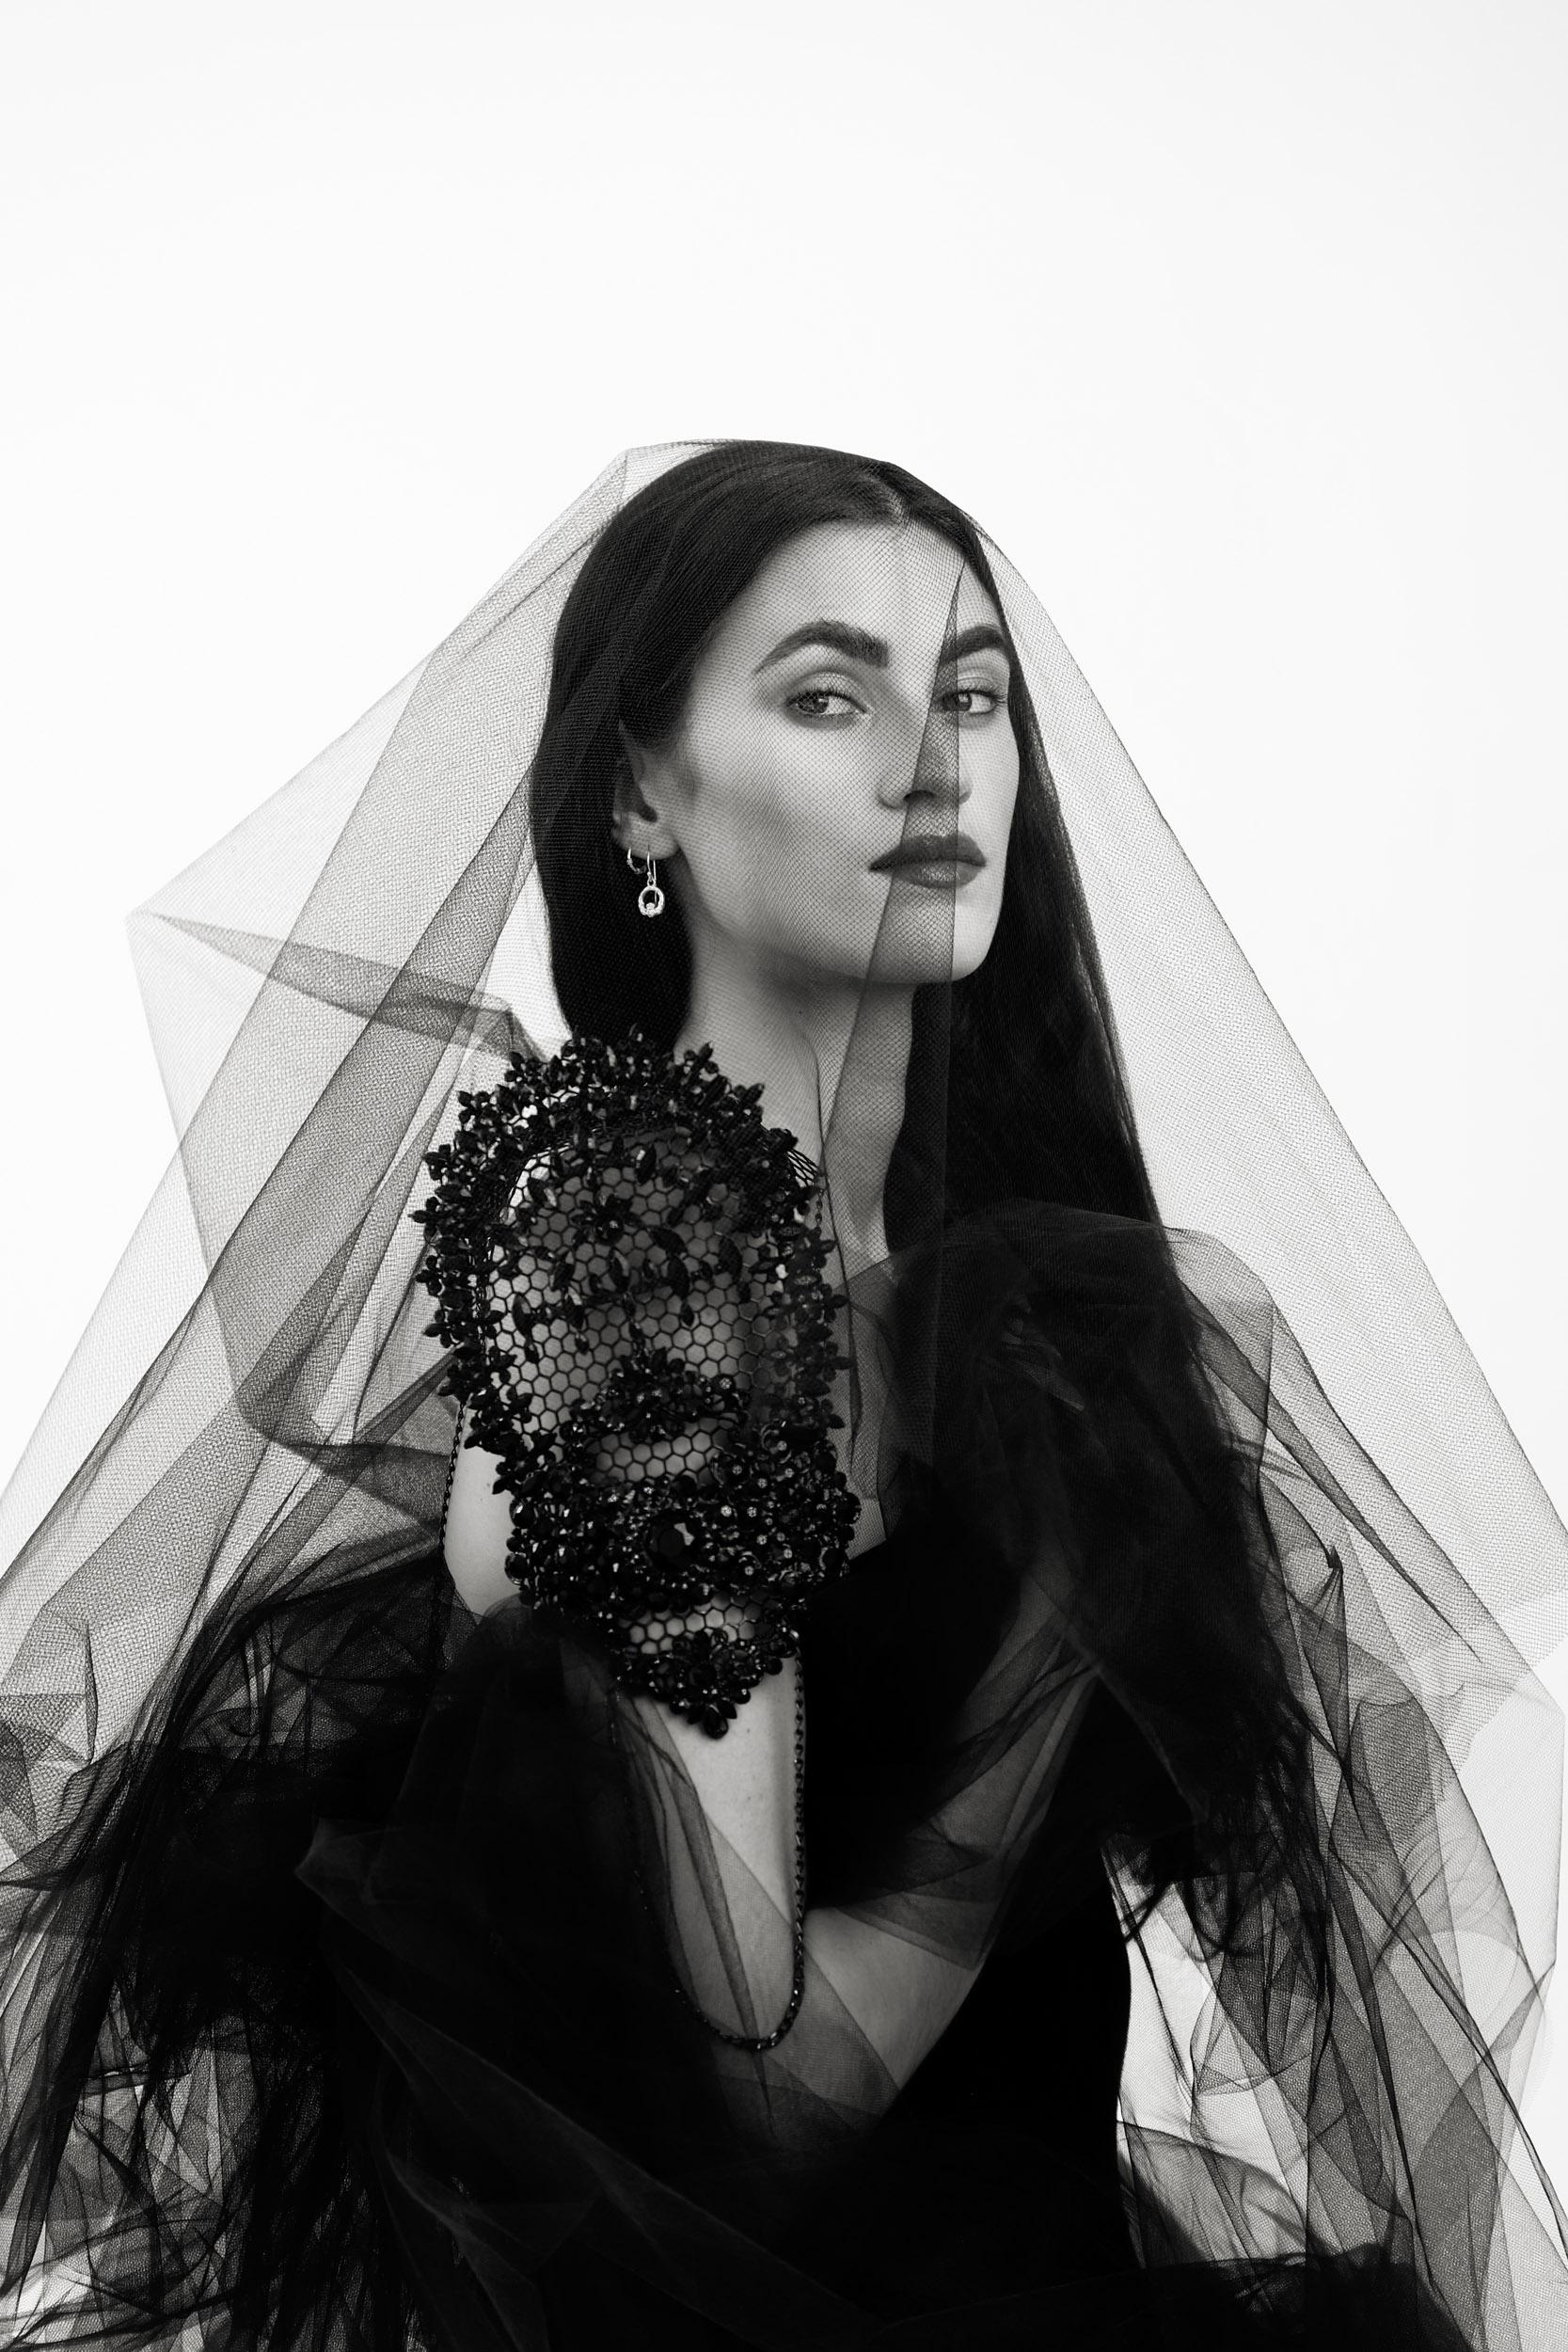 Categorie: Glamour, Portrait - Ph: ARLEN KESHISHIAN - Model: EMILY GRACE - Location: California, Stati Uniti